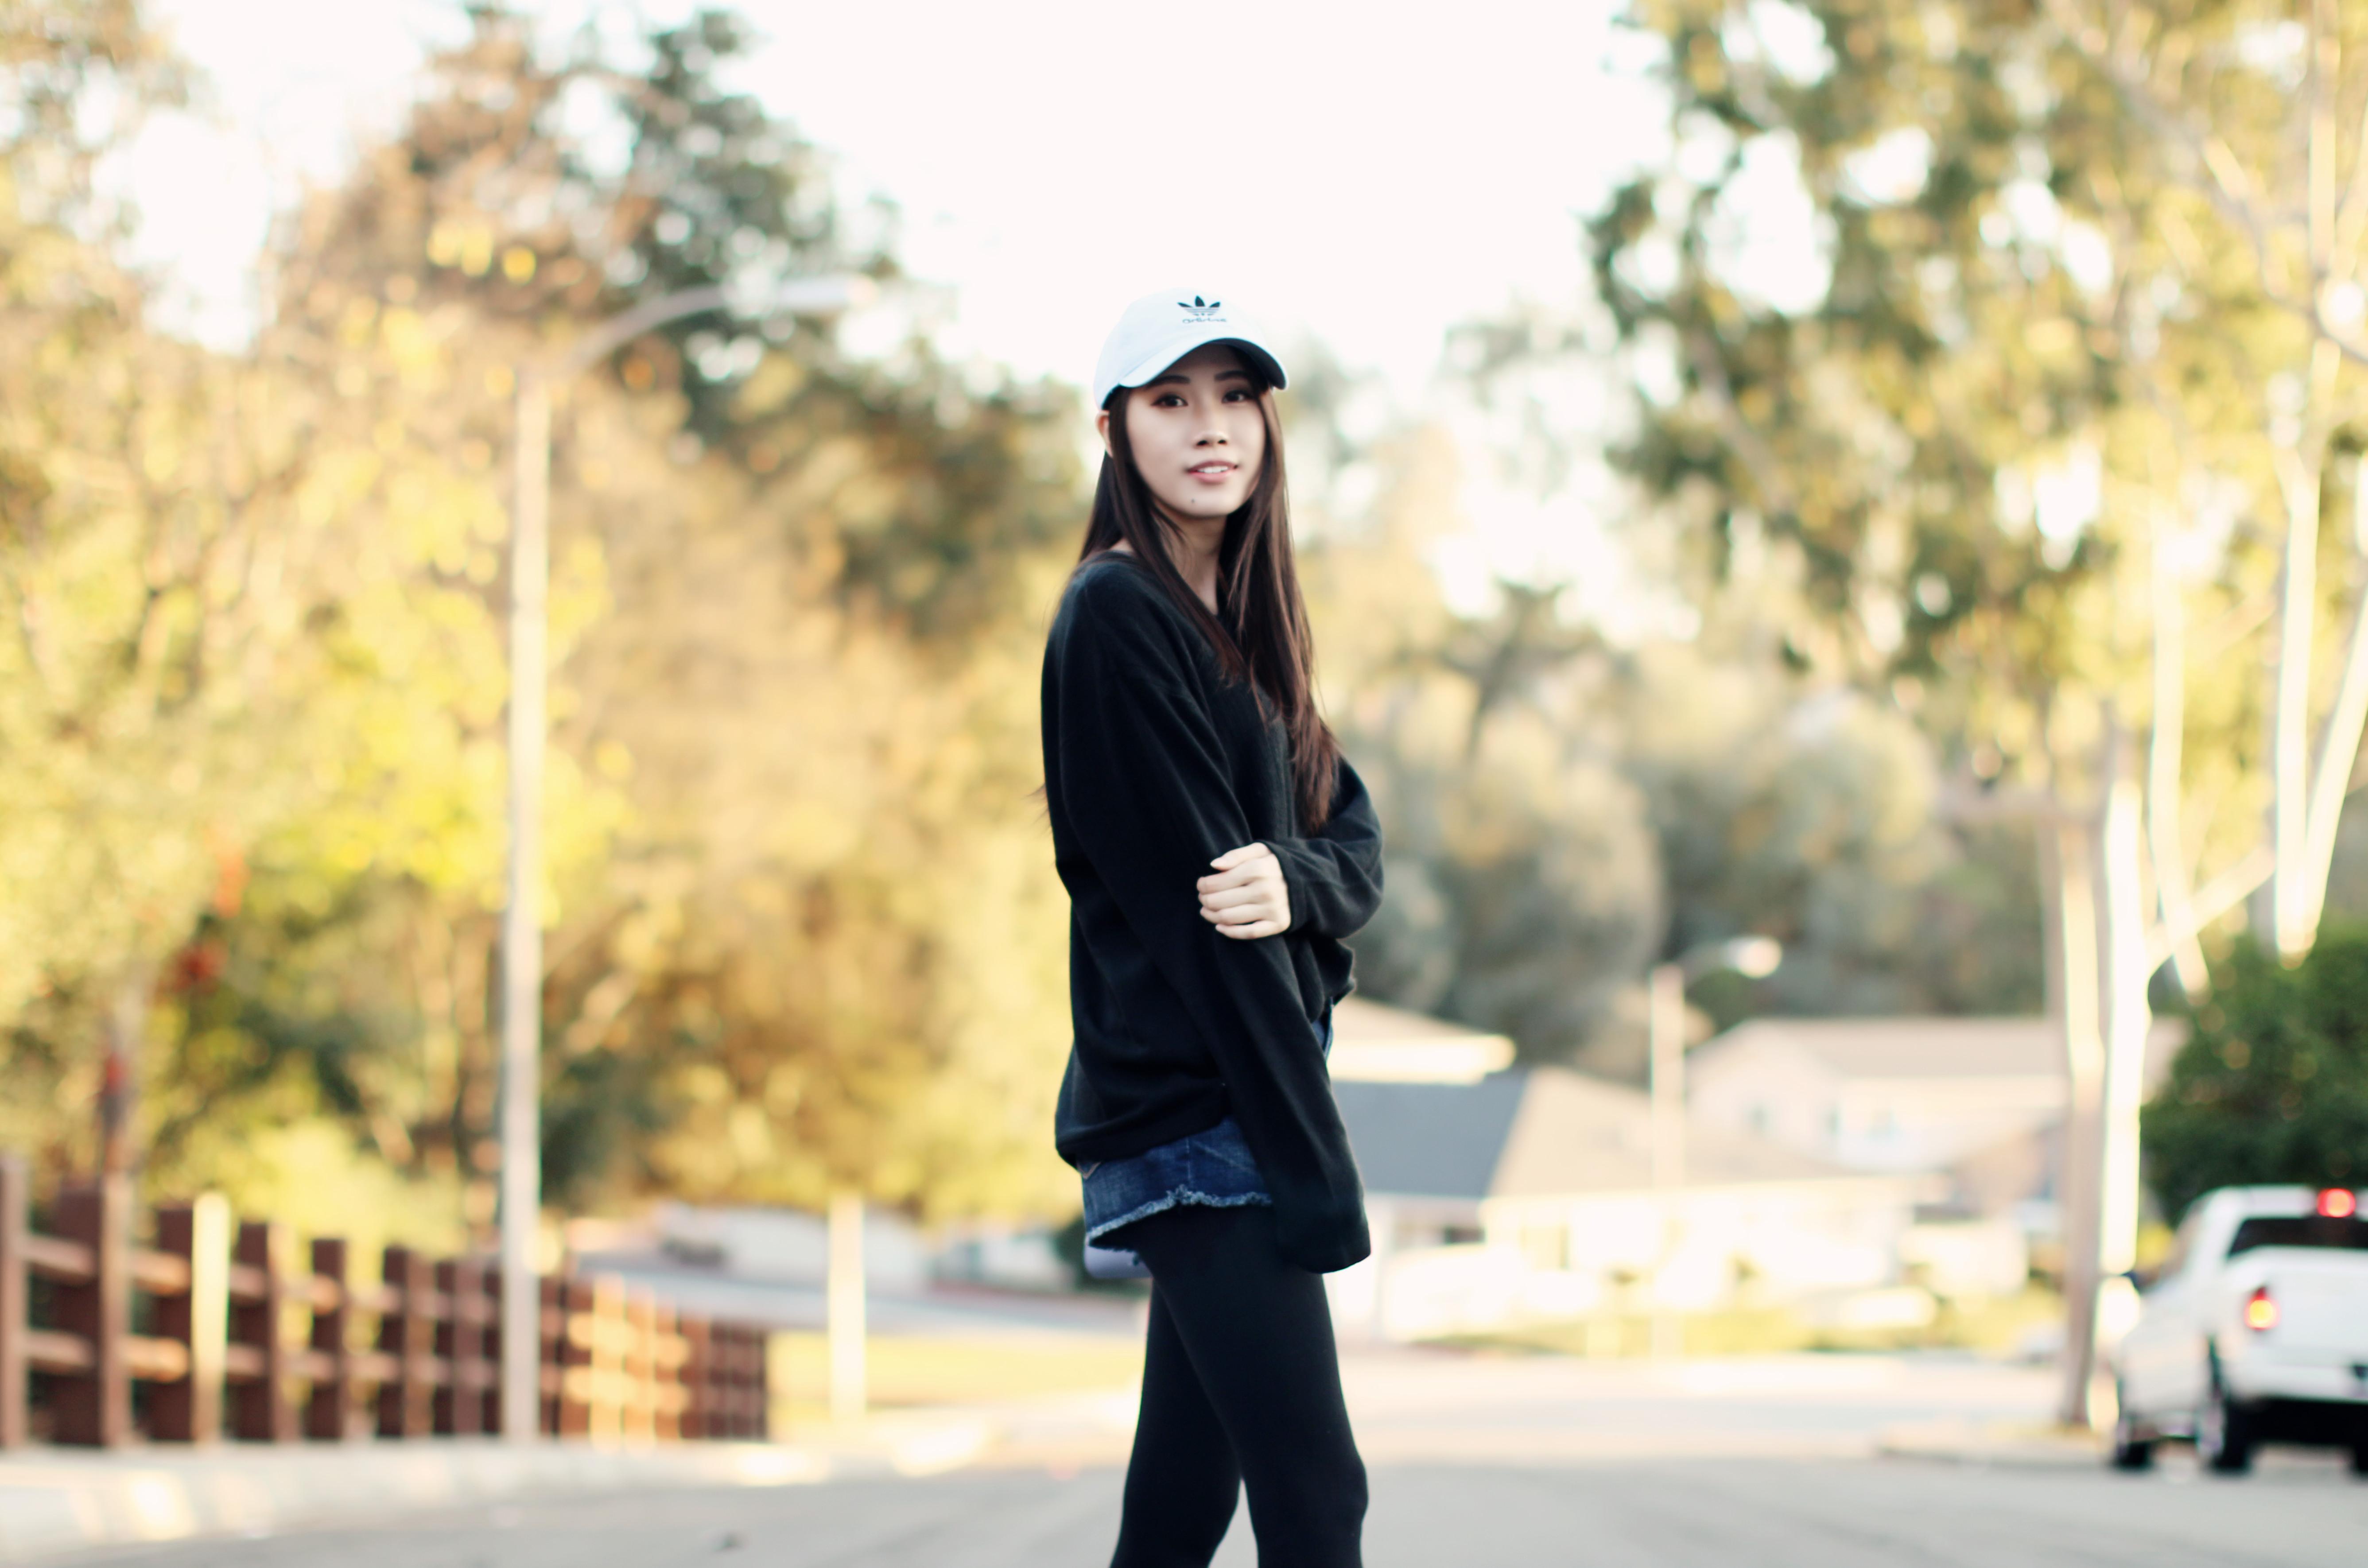 4351-ootd-fashion-style-outfitoftheday-wiwt-streetstyle-adidas-urbanoutfitters-hm-f21xme-nike-elizabeeetht-clothestoyouuu